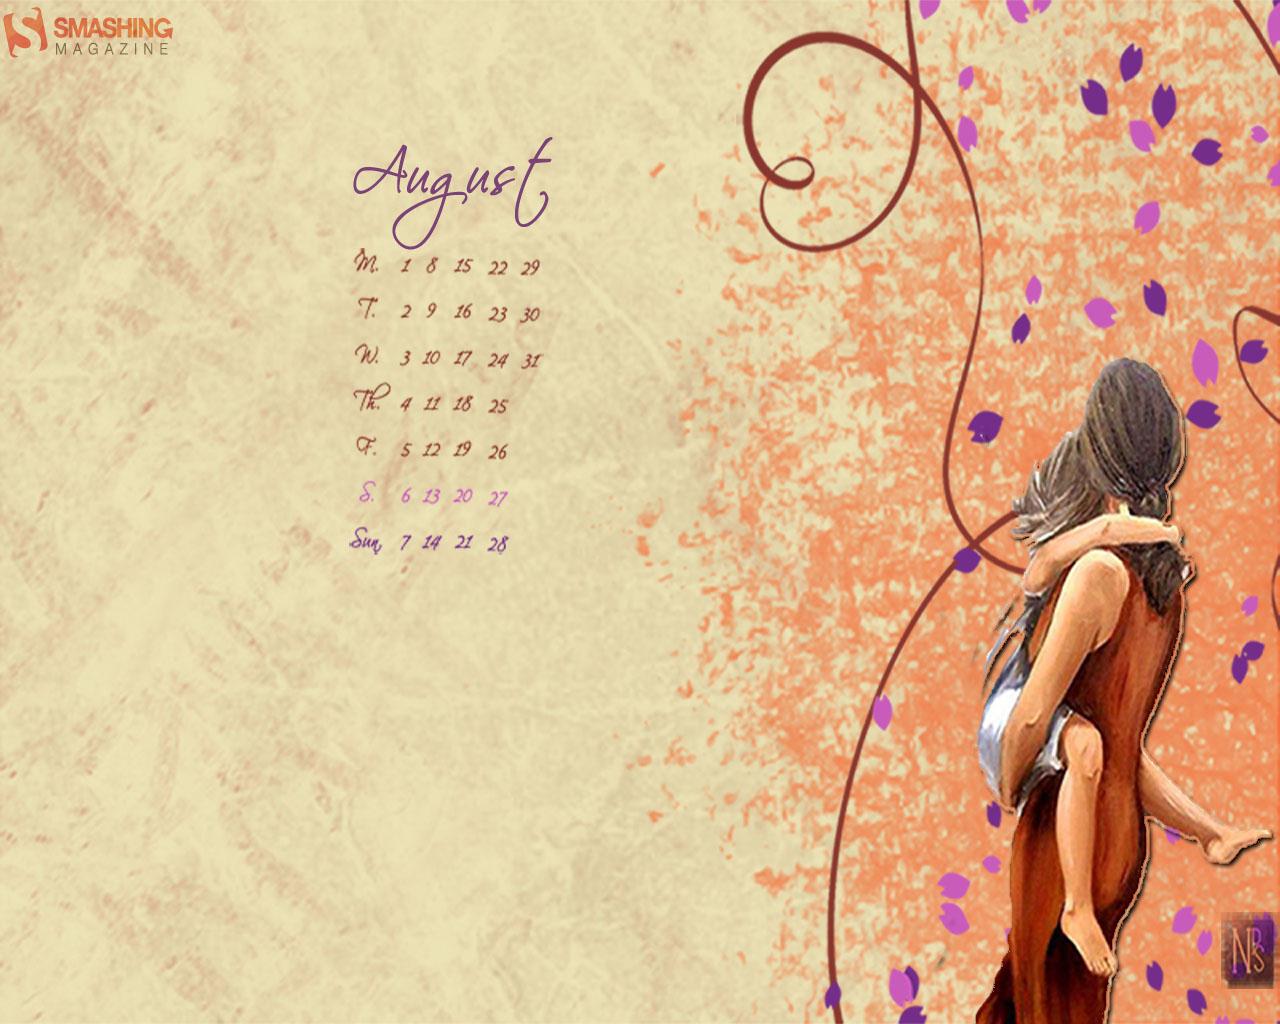 http://3.bp.blogspot.com/-t90O61TJLEM/Tji_nCfovHI/AAAAAAAAwYw/i4vYFeHwq9c/s1600/august-11-with_love_to_mom__29-calendar-1280x1024.jpg